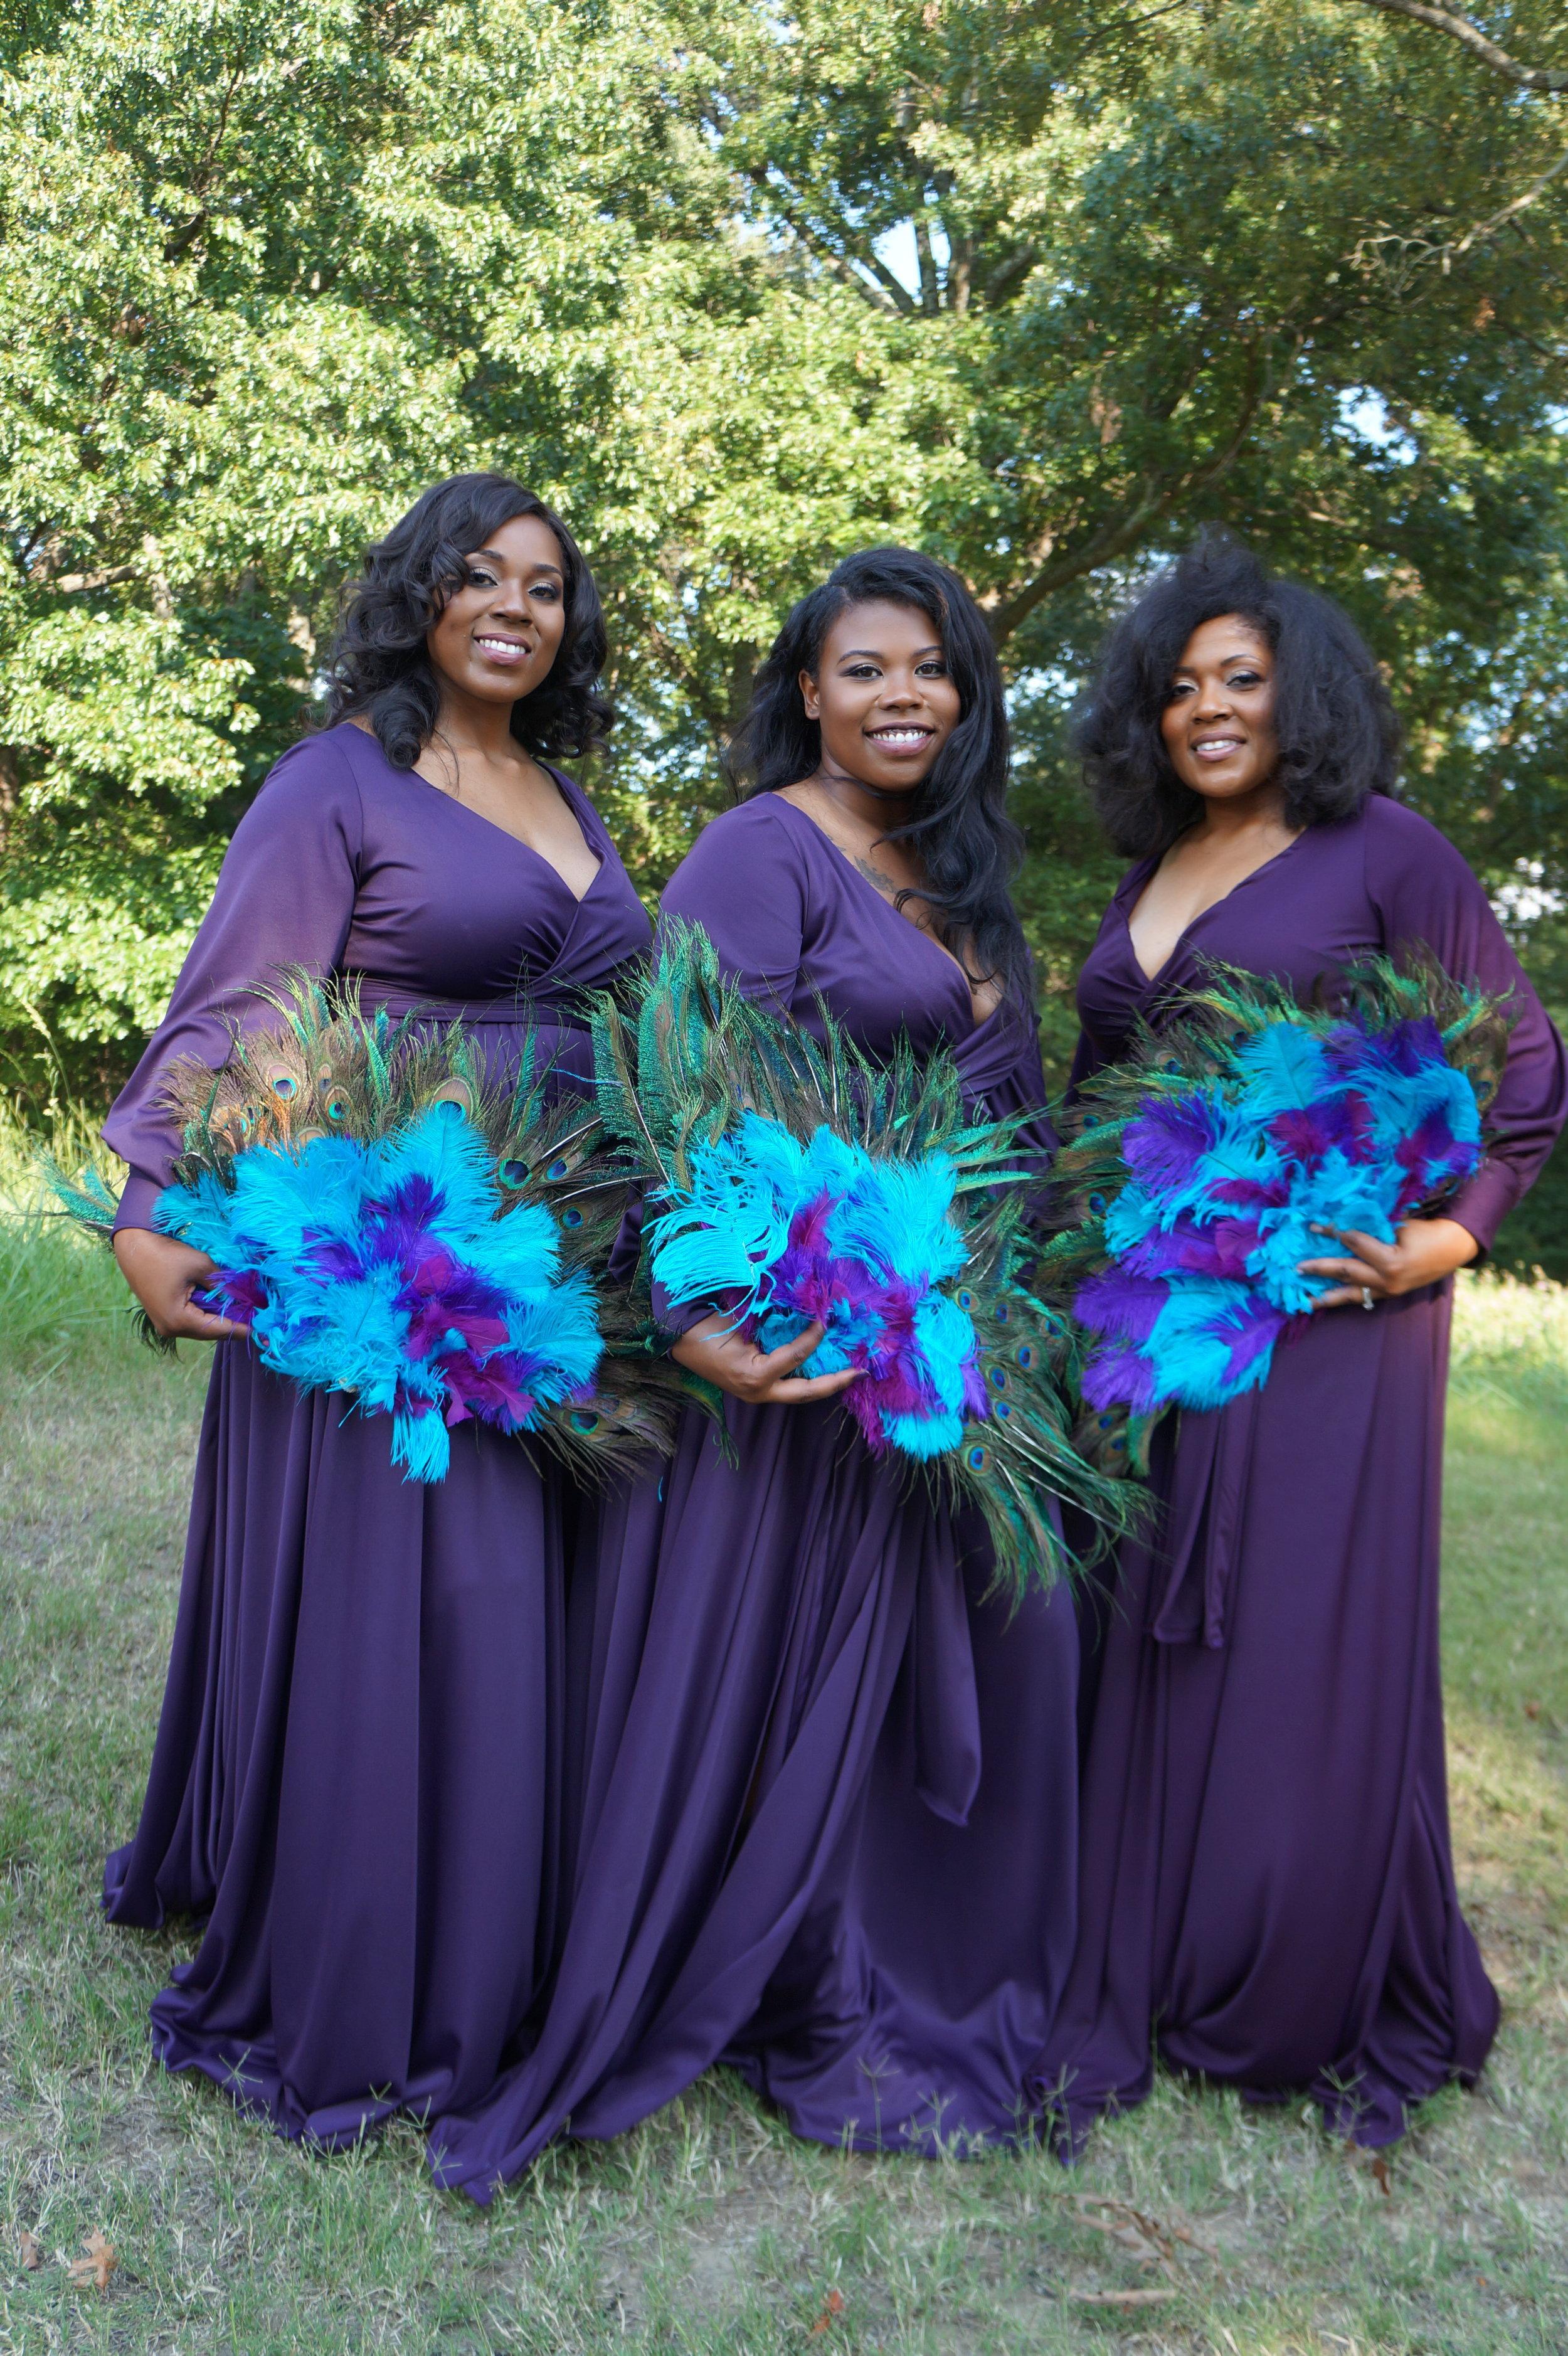 Andrea Fenise Memphis Fashion Blogger shares her bridal work